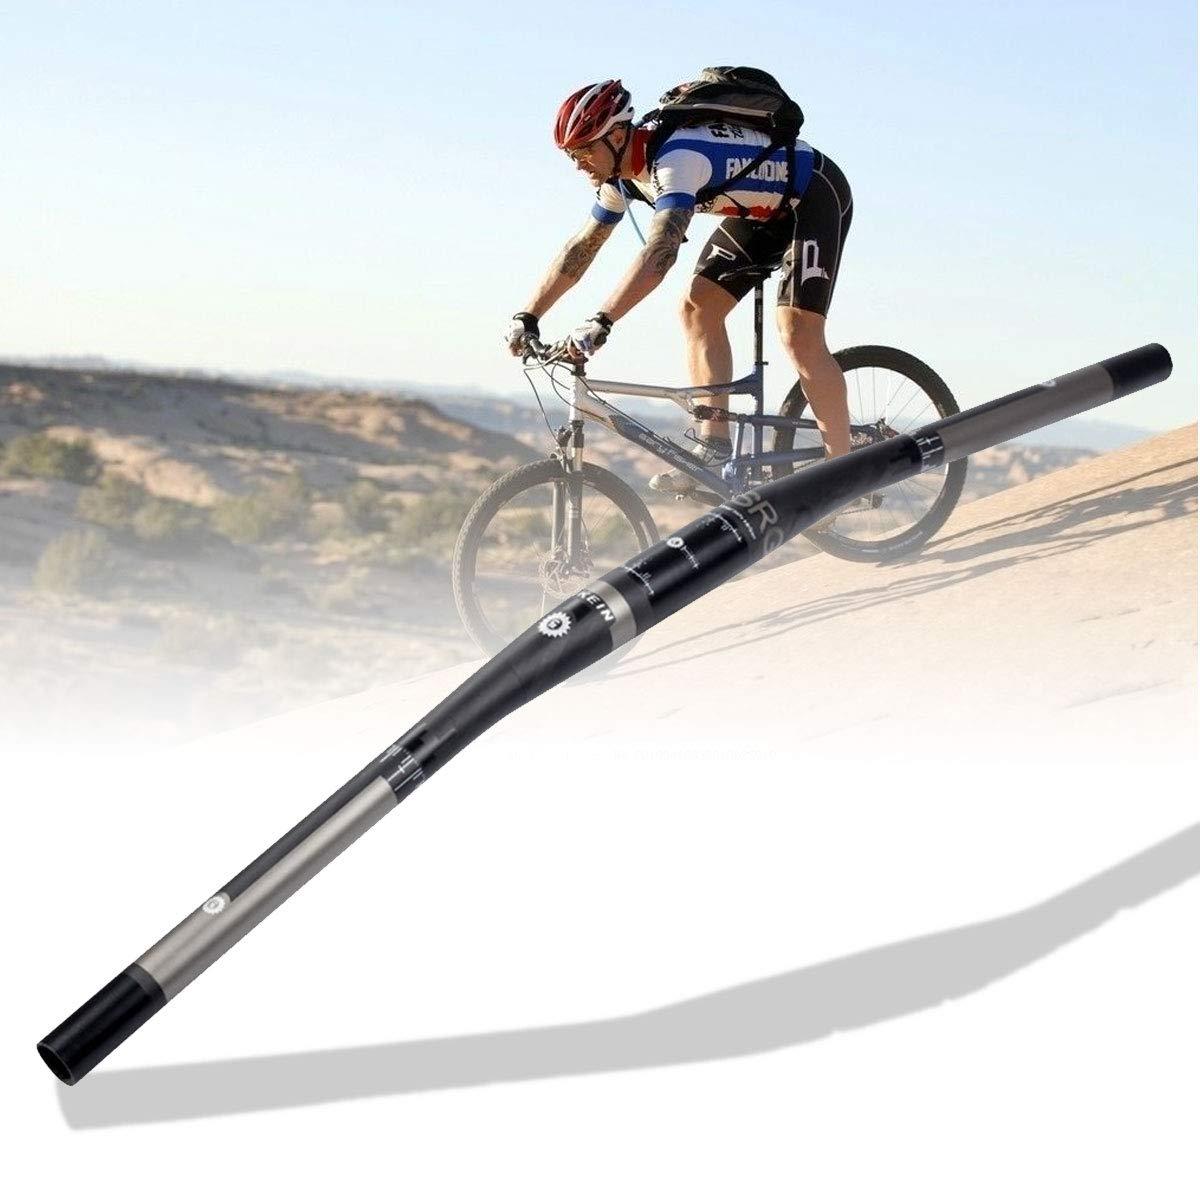 Lidauto Fahrrad MTB Lenker Mountainbike Enduro 690 720 750mm